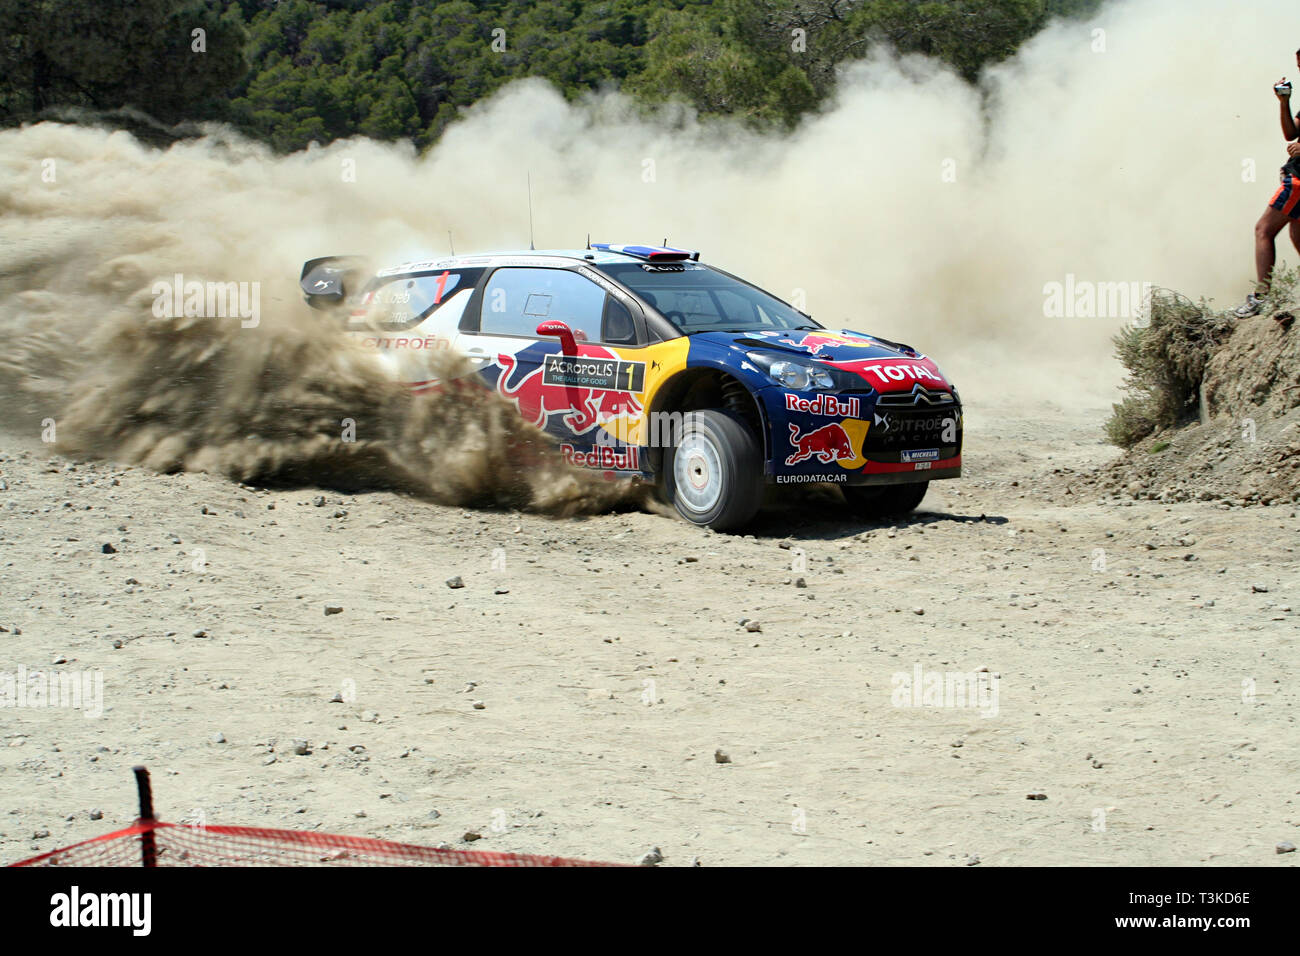 2011 Acropolis Rally, Special Stage 16 (Aghii Theodori 2). Sébastien Loeb - Daniel Elena, Citroën DS3 WRC (finished 2nd) - Stock Image